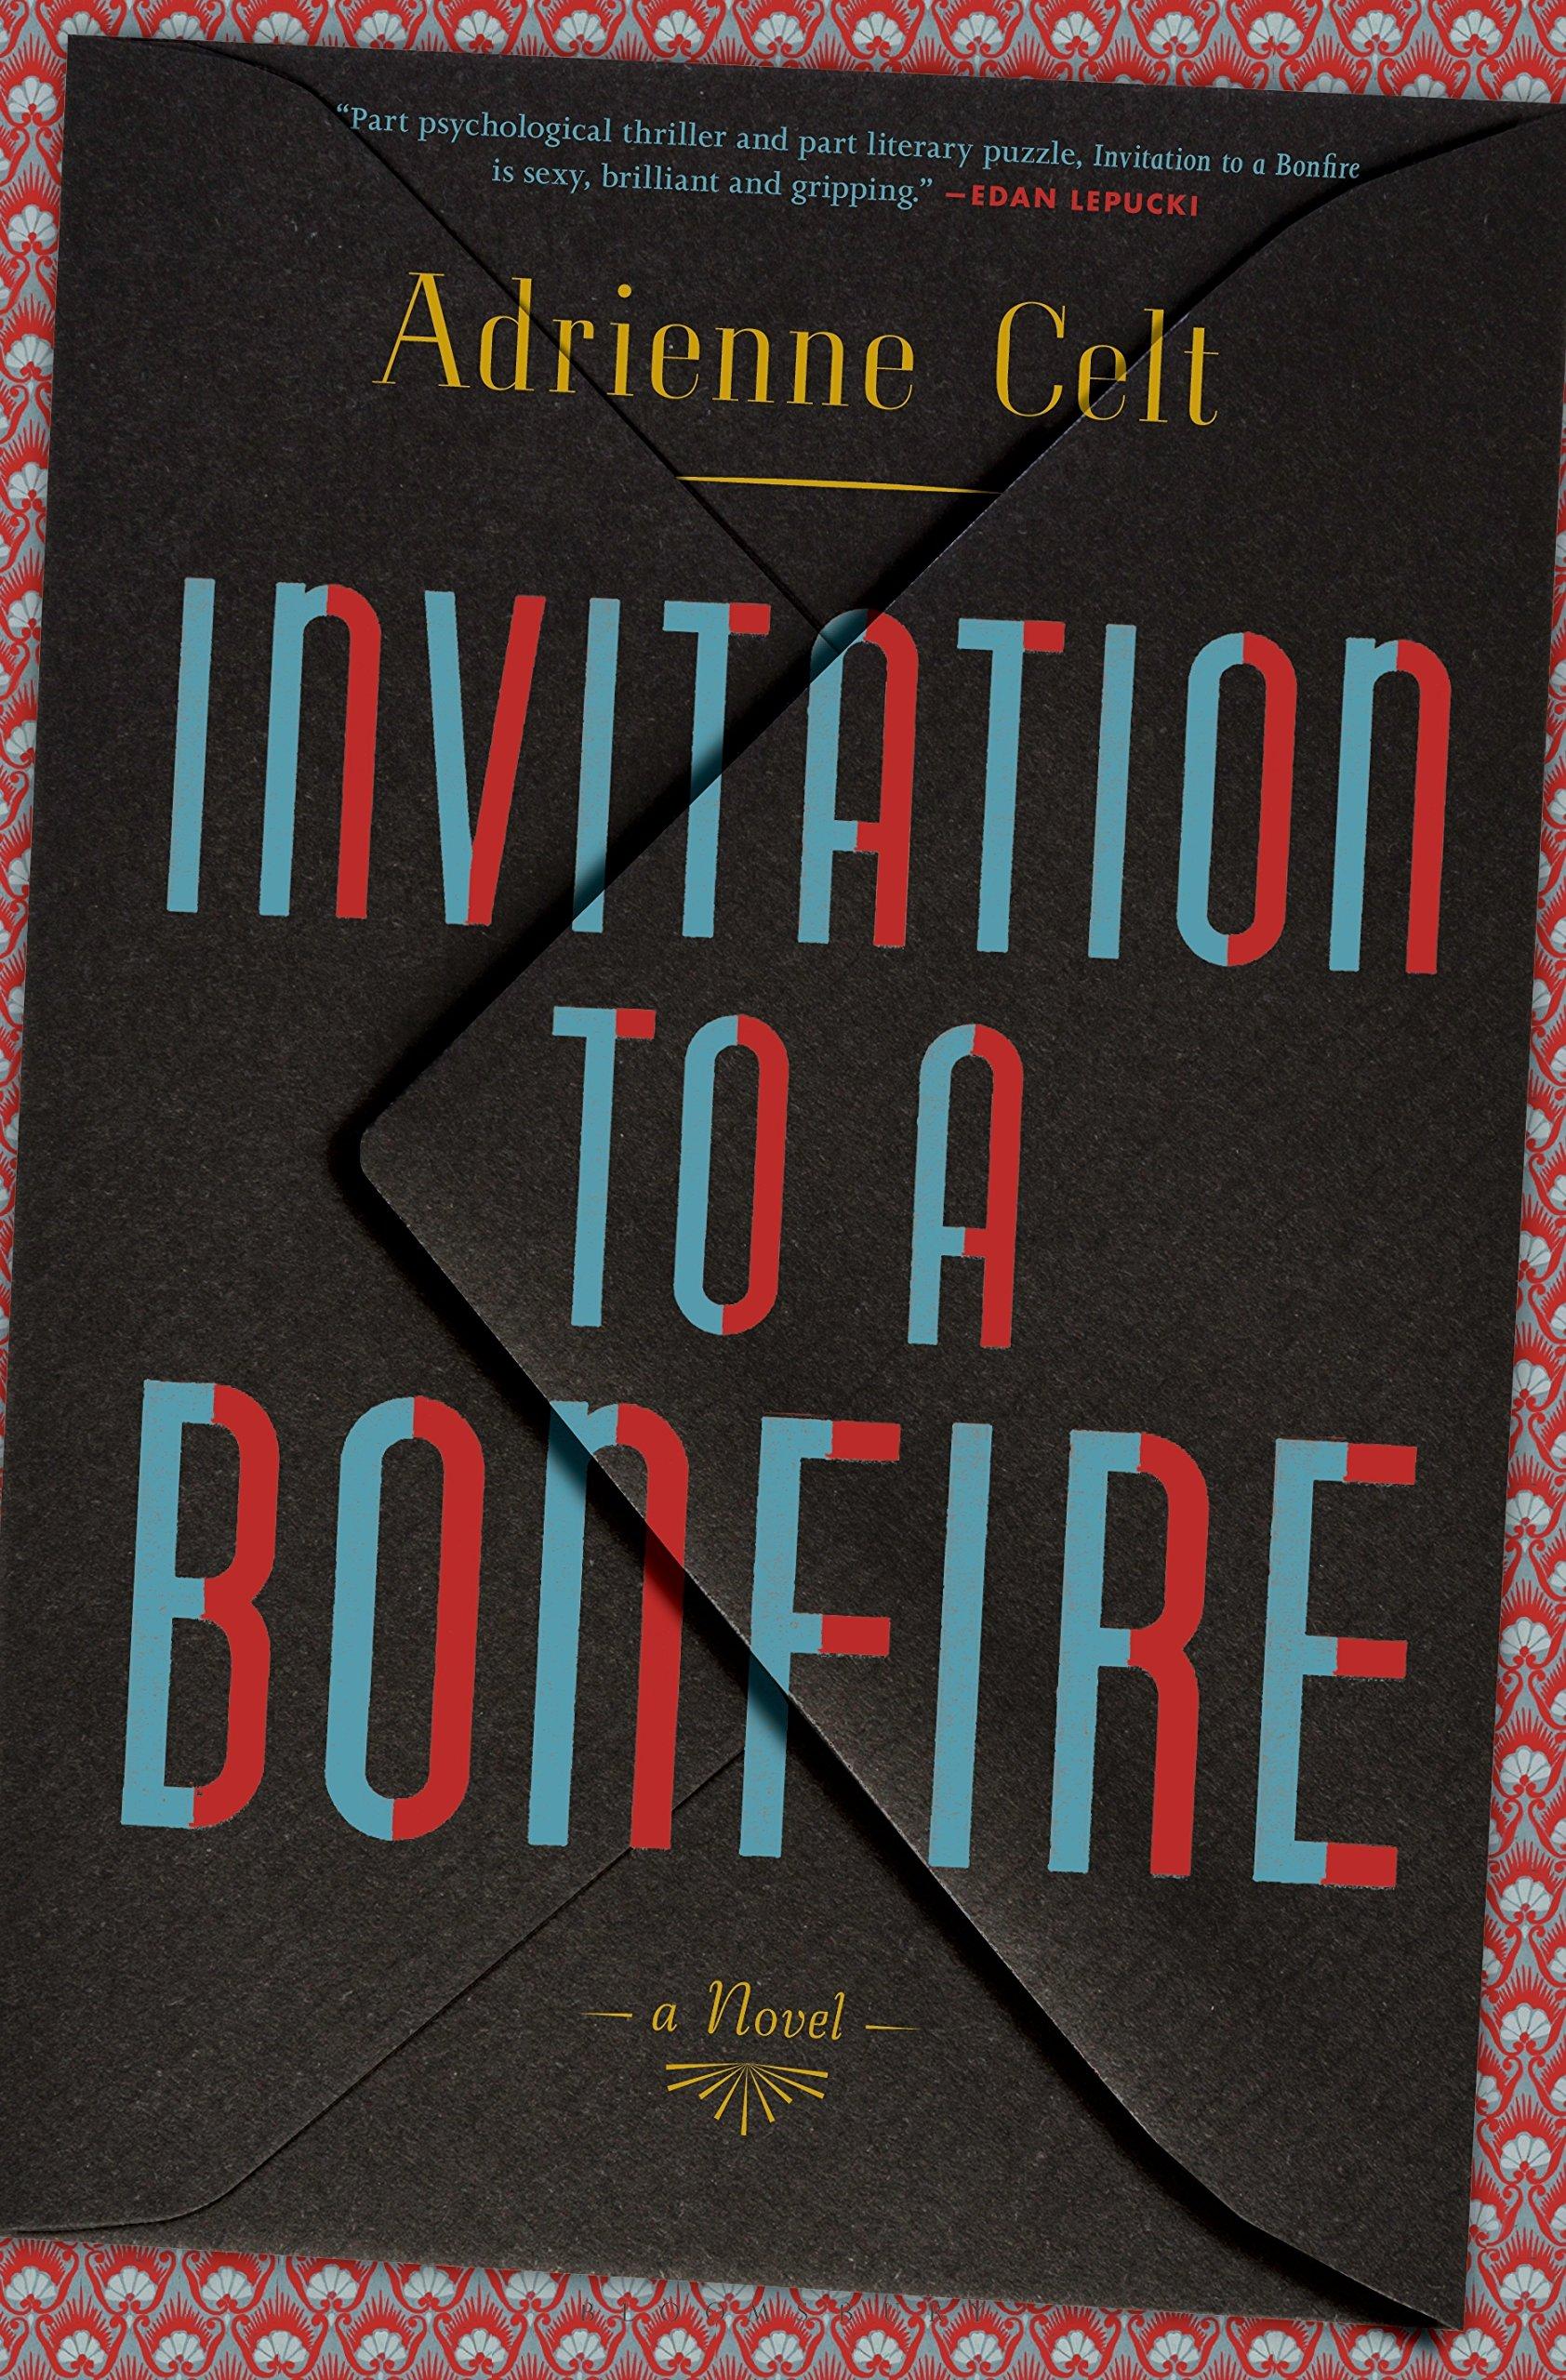 Invitation to a bonfire adrienne celt 9781635571523 amazon invitation to a bonfire adrienne celt 9781635571523 amazon books stopboris Gallery